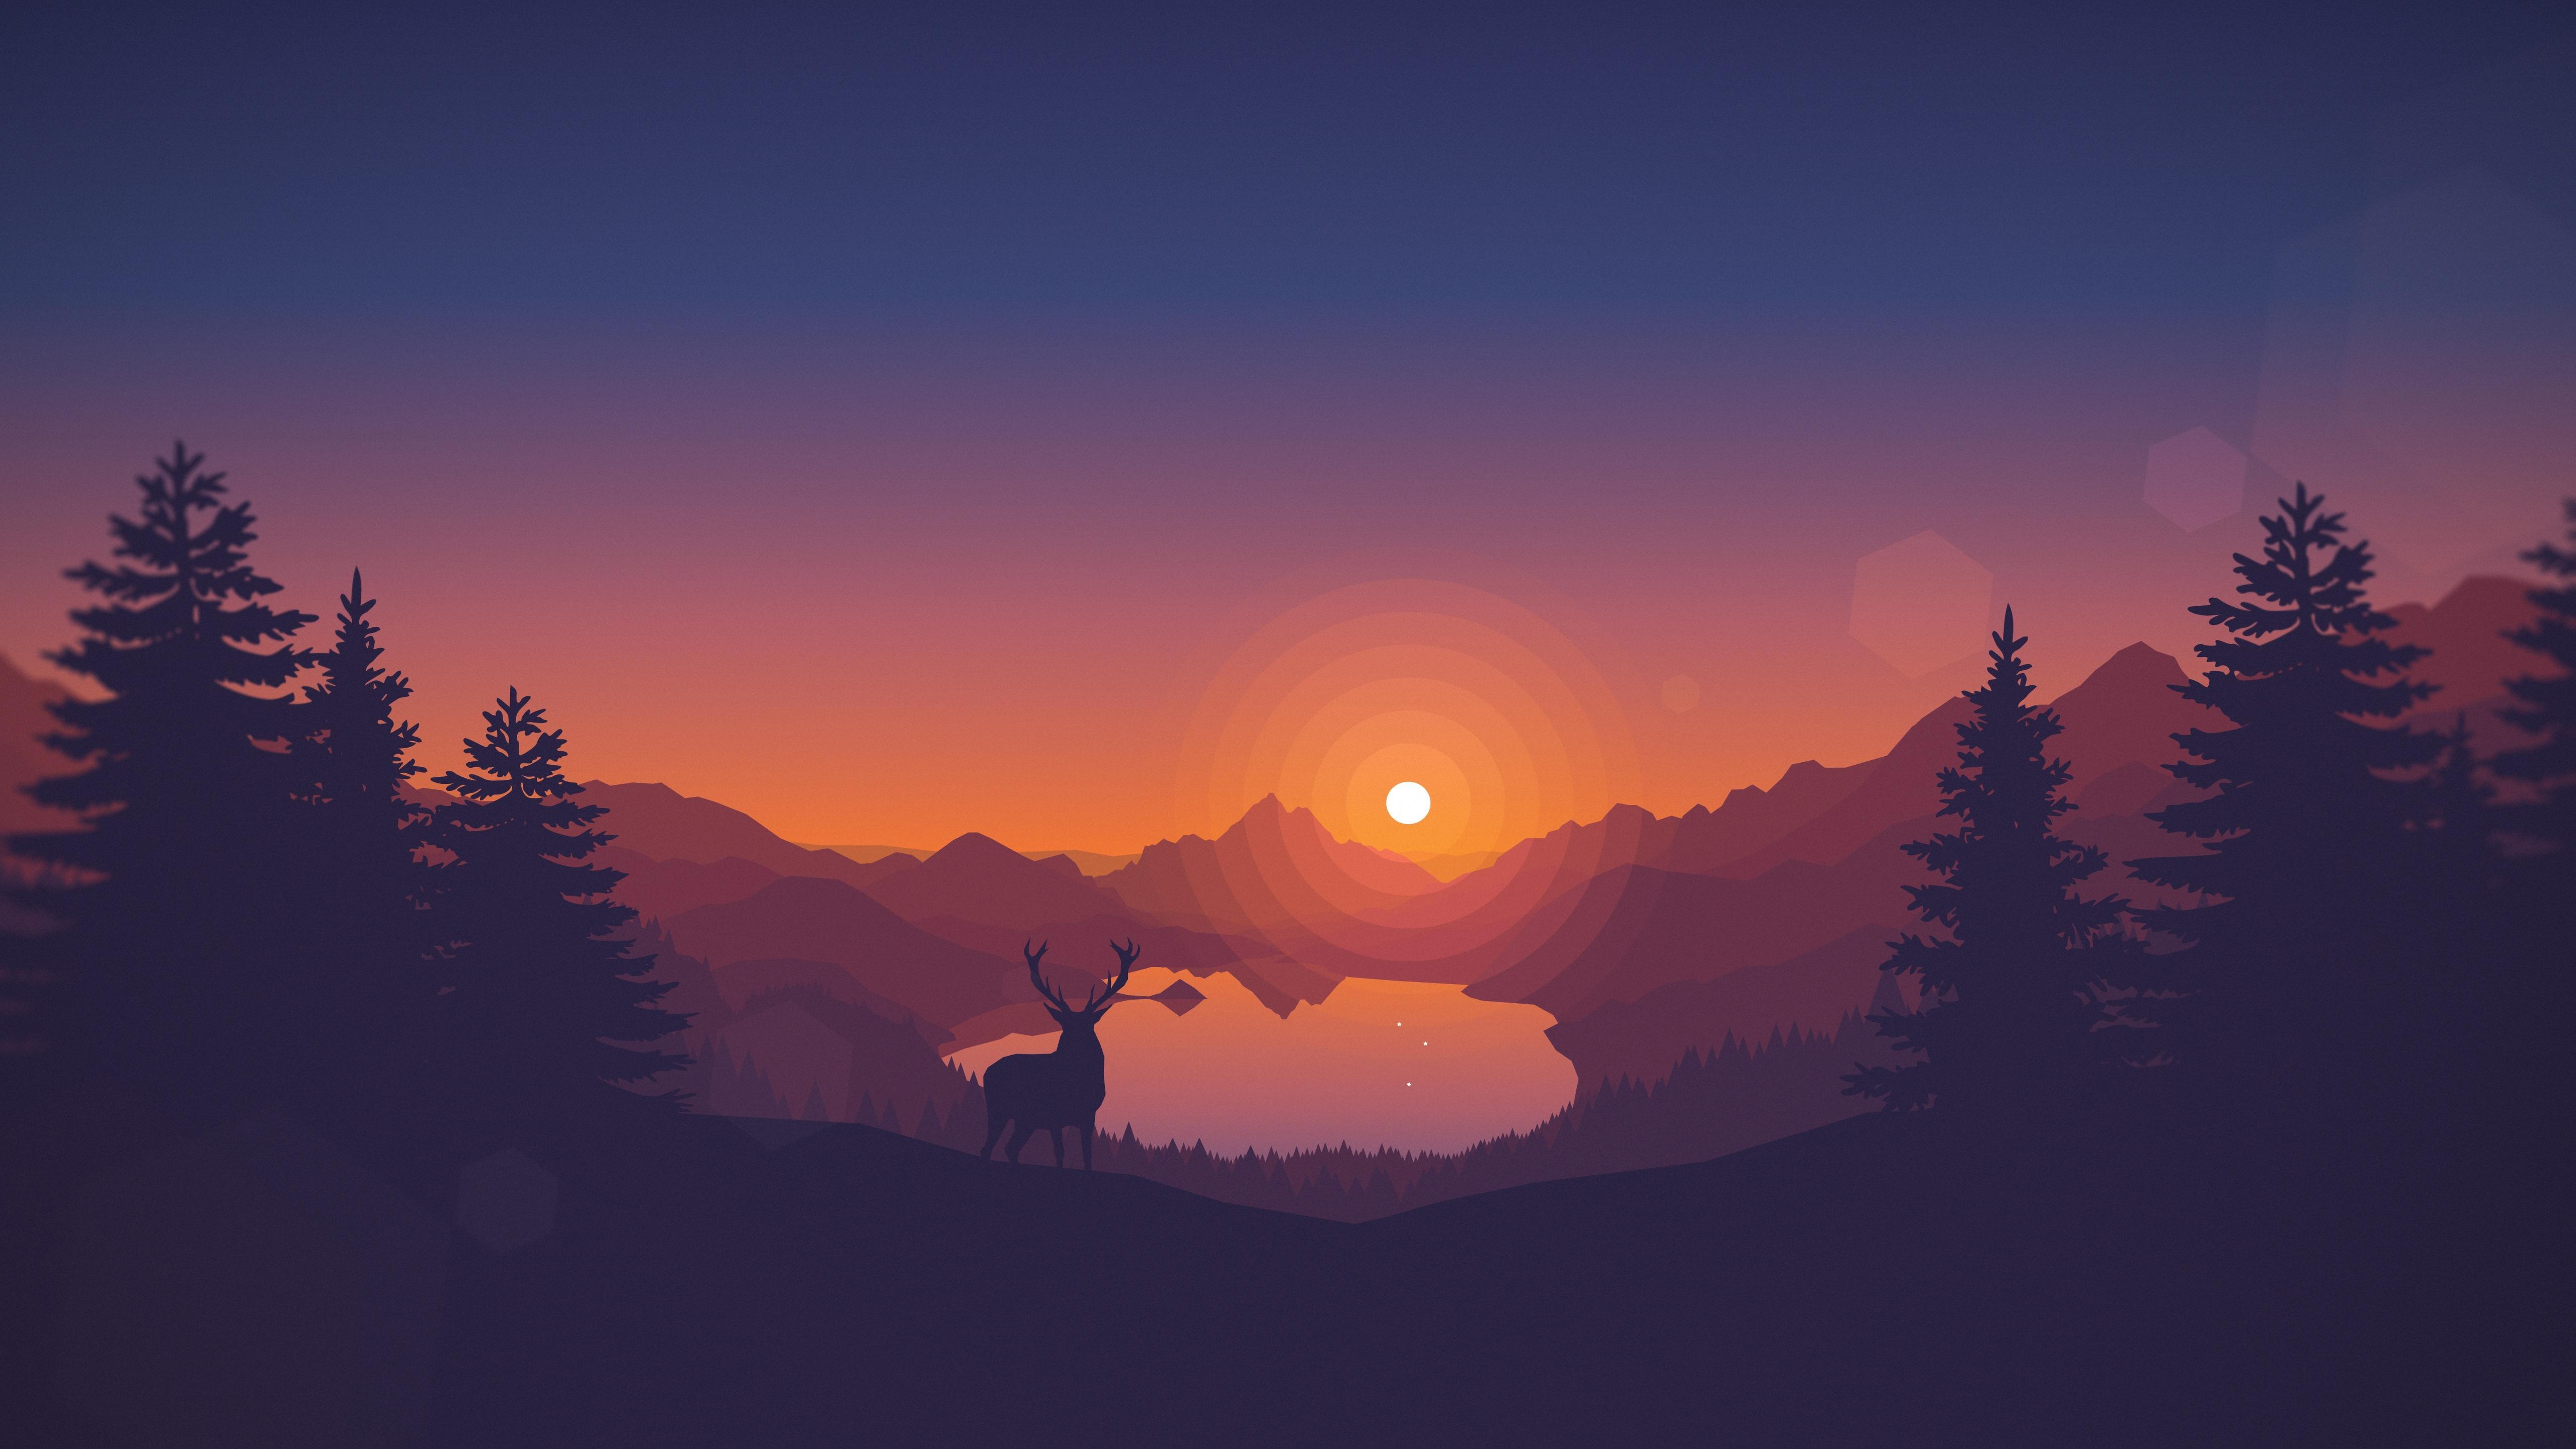 Firewatch Background